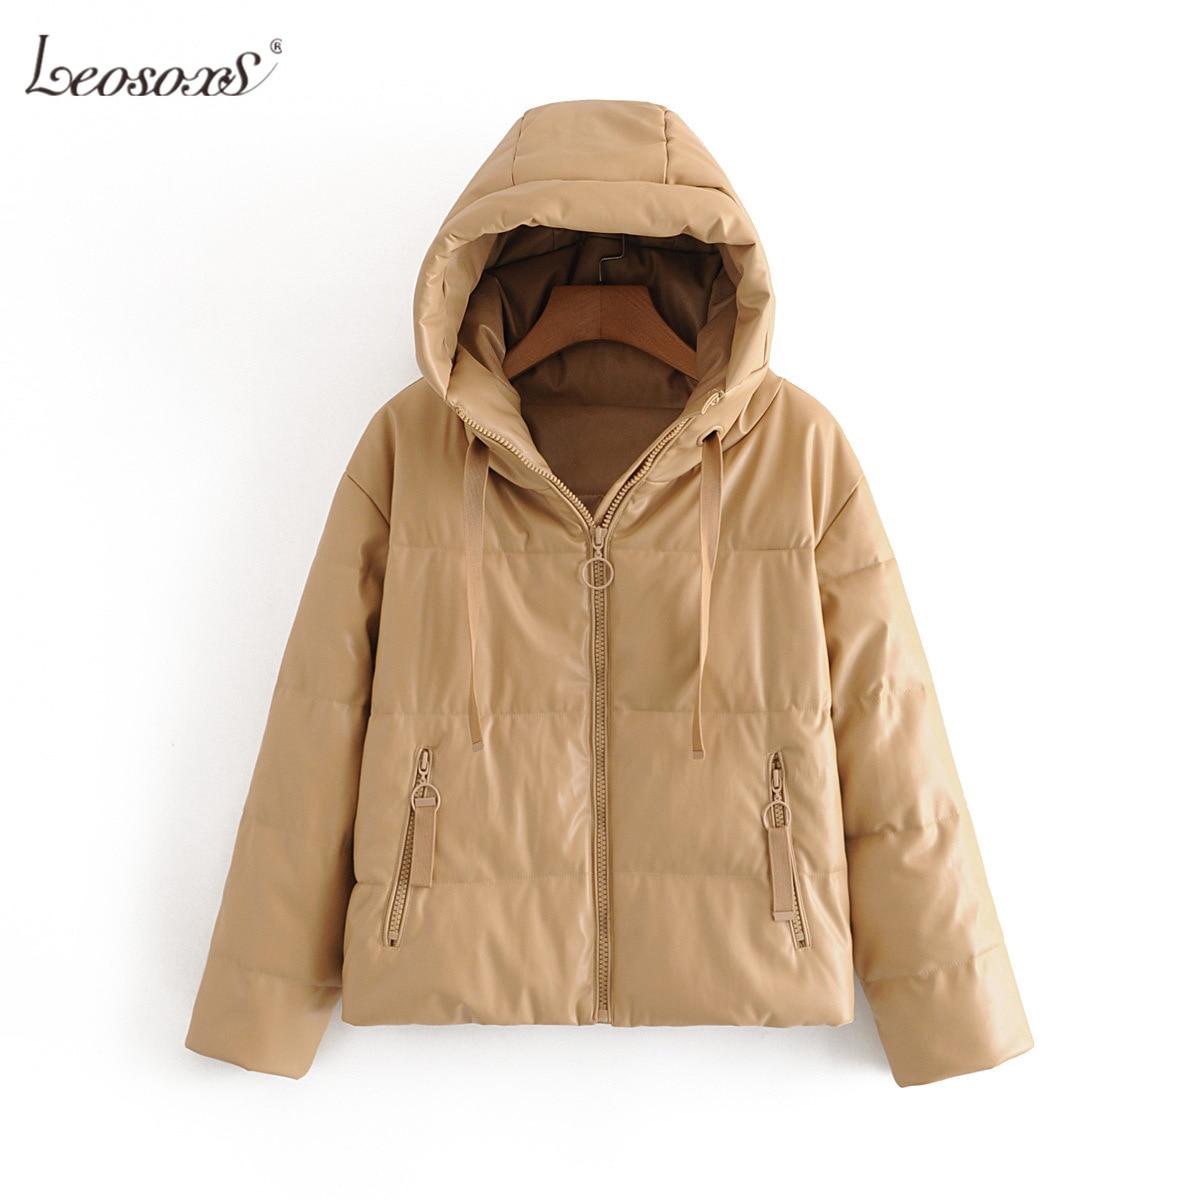 Women Thick Warm PU Faux Leather Padded Coat 2021 Winter Zipper Hooded Jacket Parka Long Sleeve Pockets Outerwear Tops enlarge